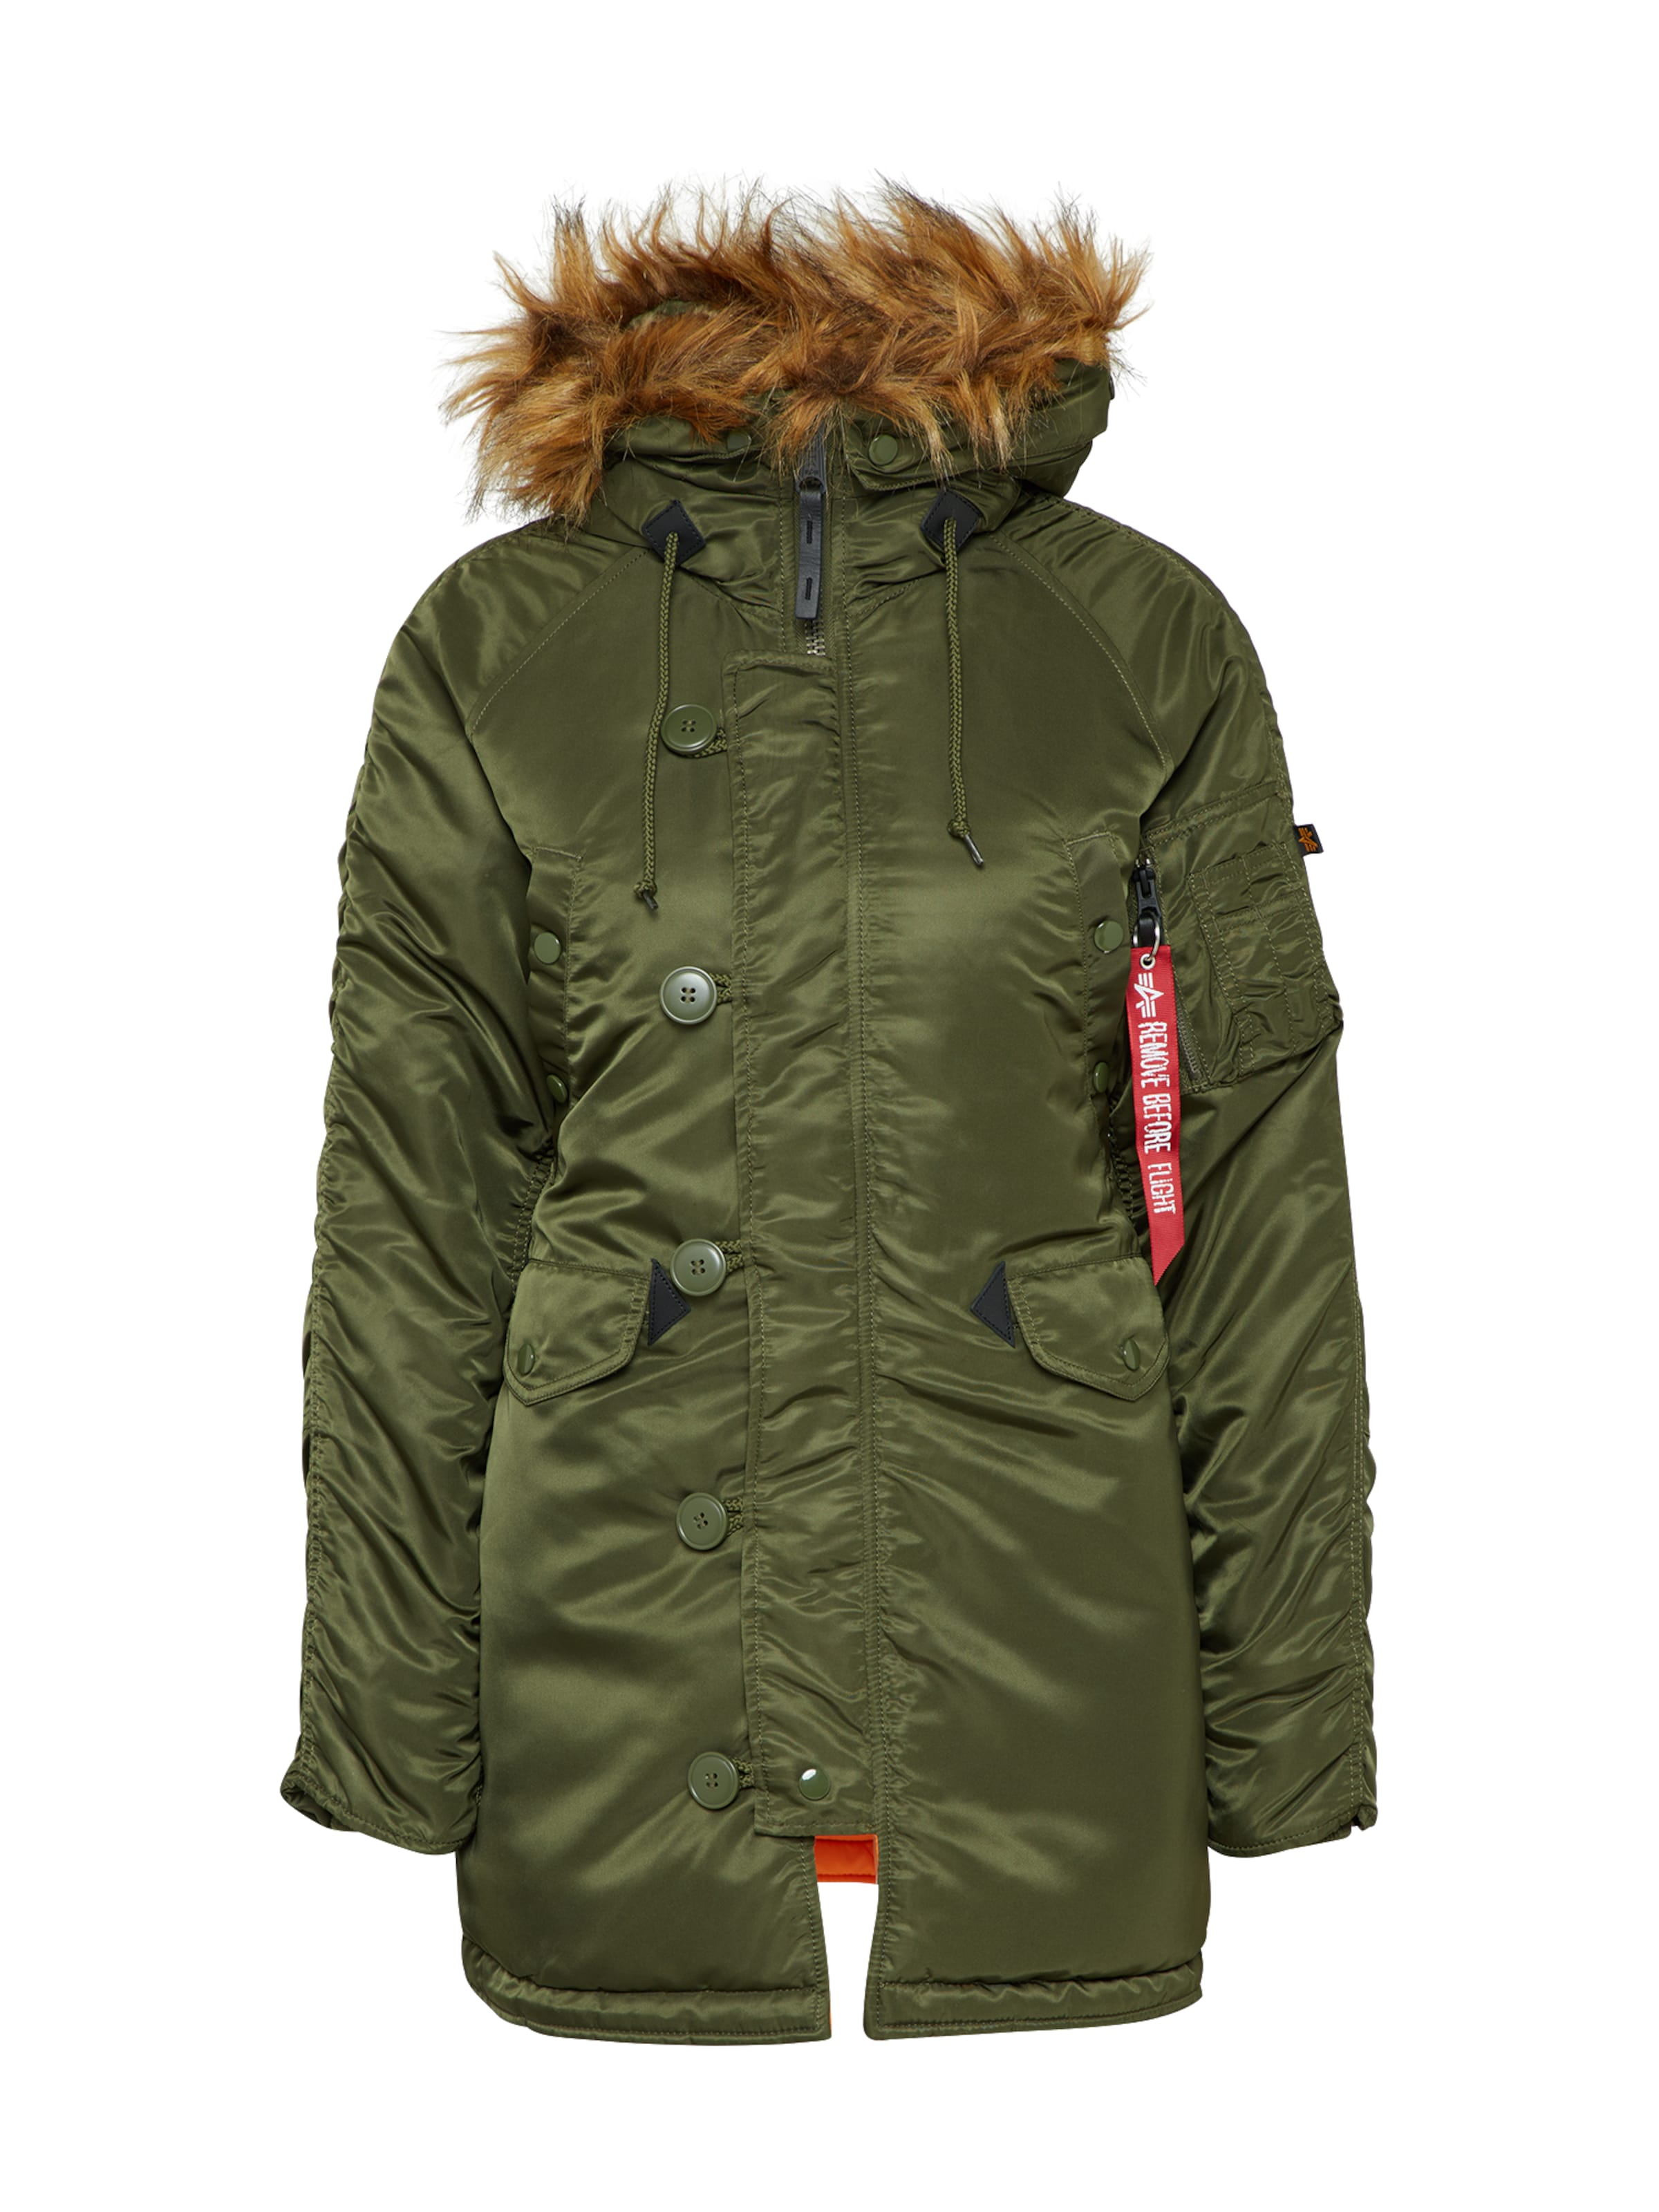 ALPHA INDUSTRIES Winterjacke mit Kapuze in dunkelgrün